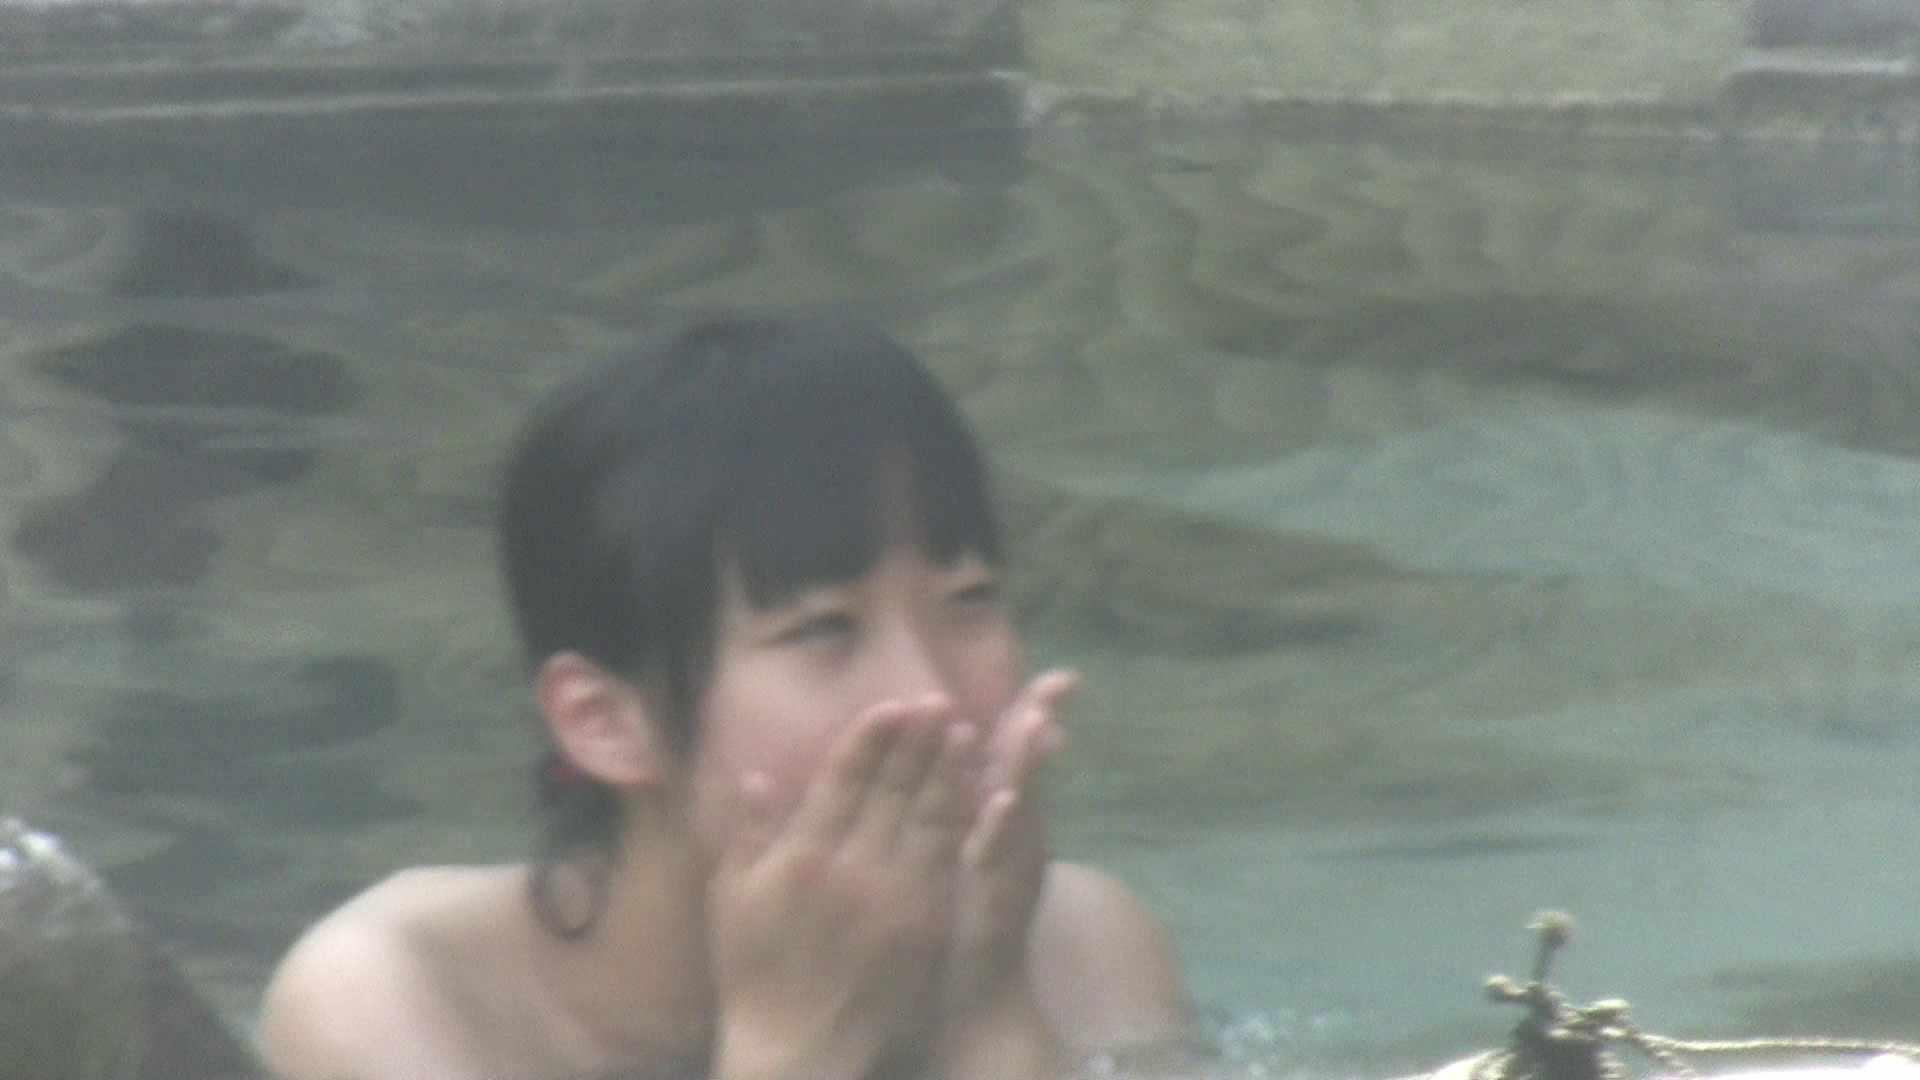 Aquaな露天風呂Vol.196 HなOL | 盗撮  91pic 65